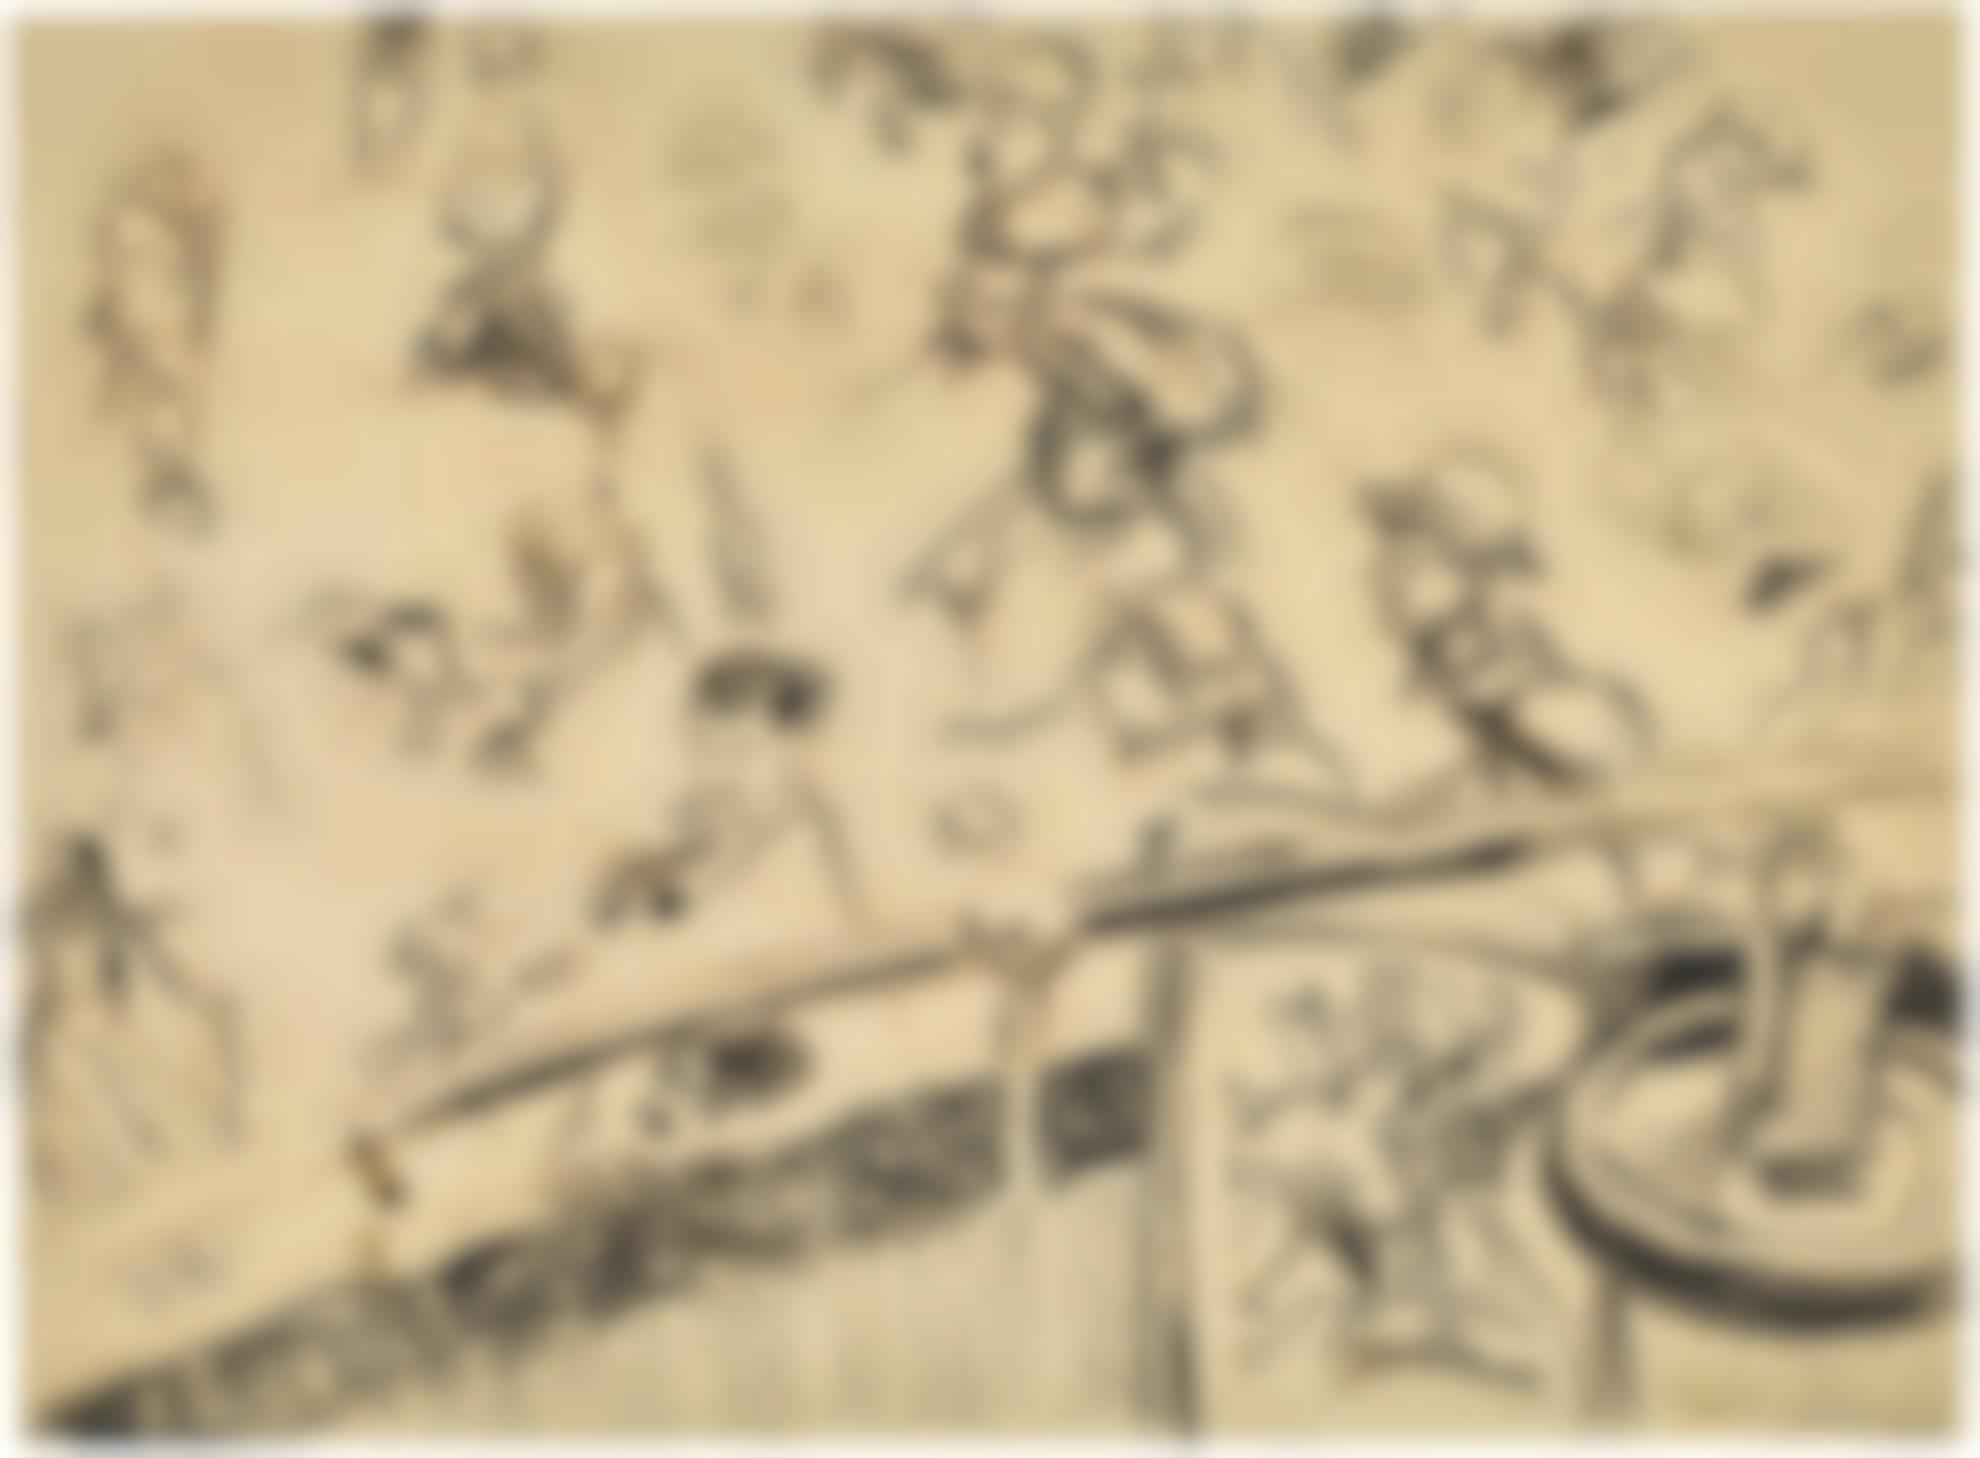 Walter Richard Sickert-The Old Mogul Tavern, Drury Lane-1906